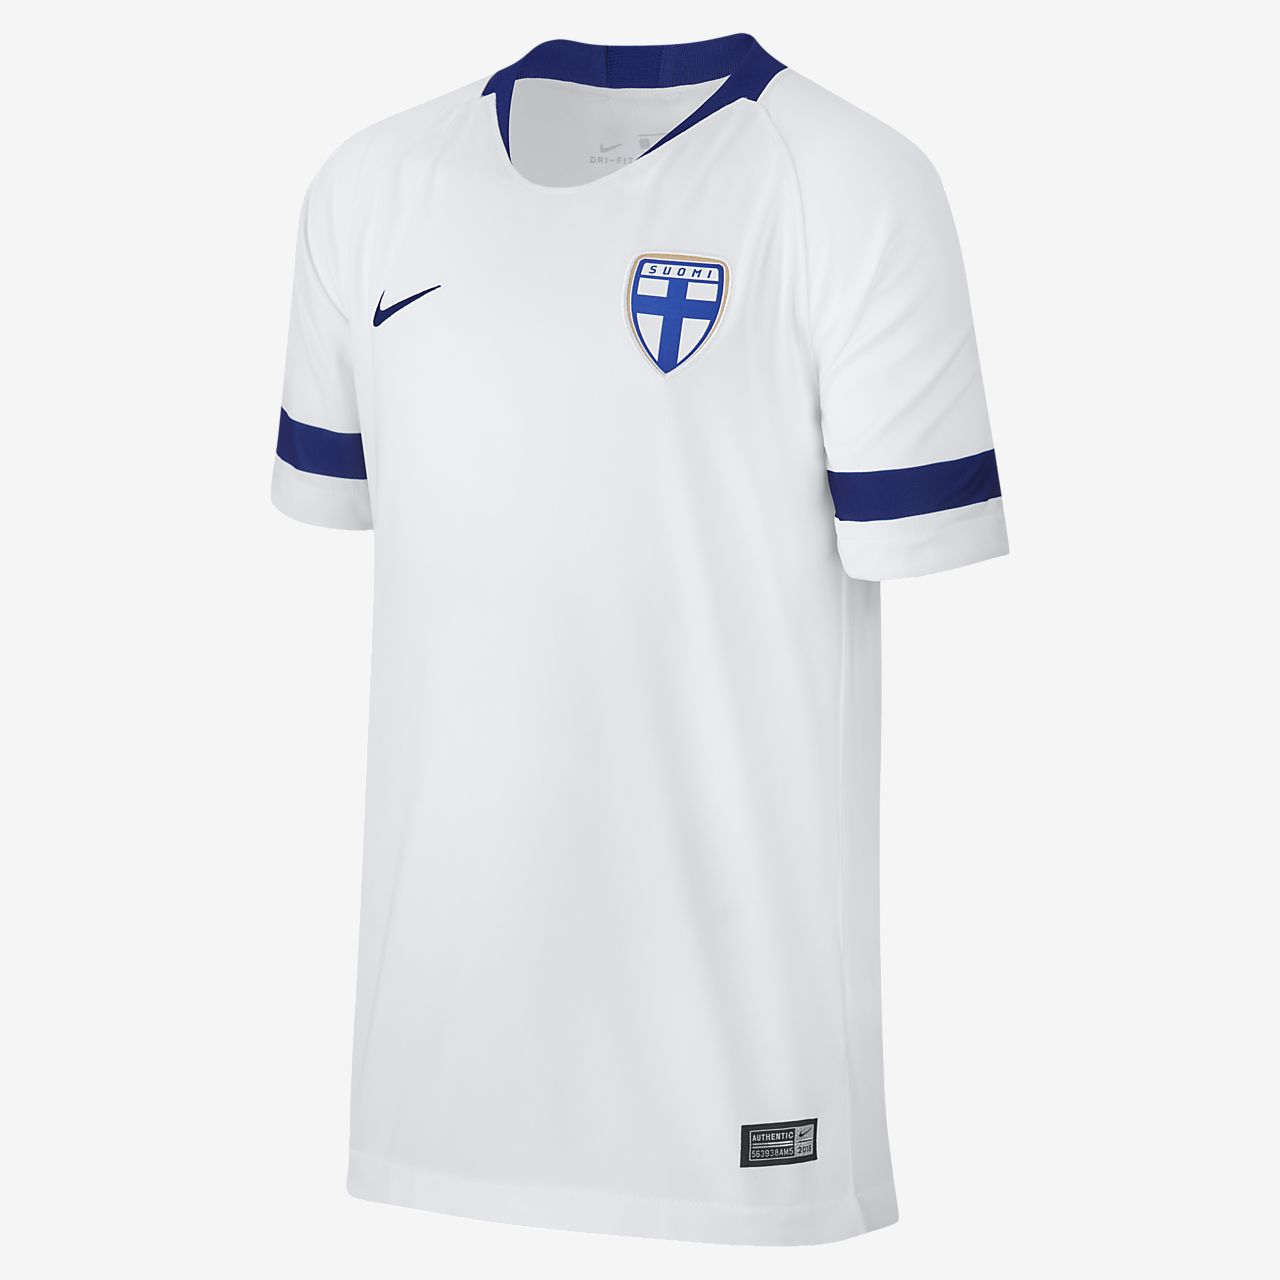 2018 Finland Stadium Home Older Kids' Football Shirt